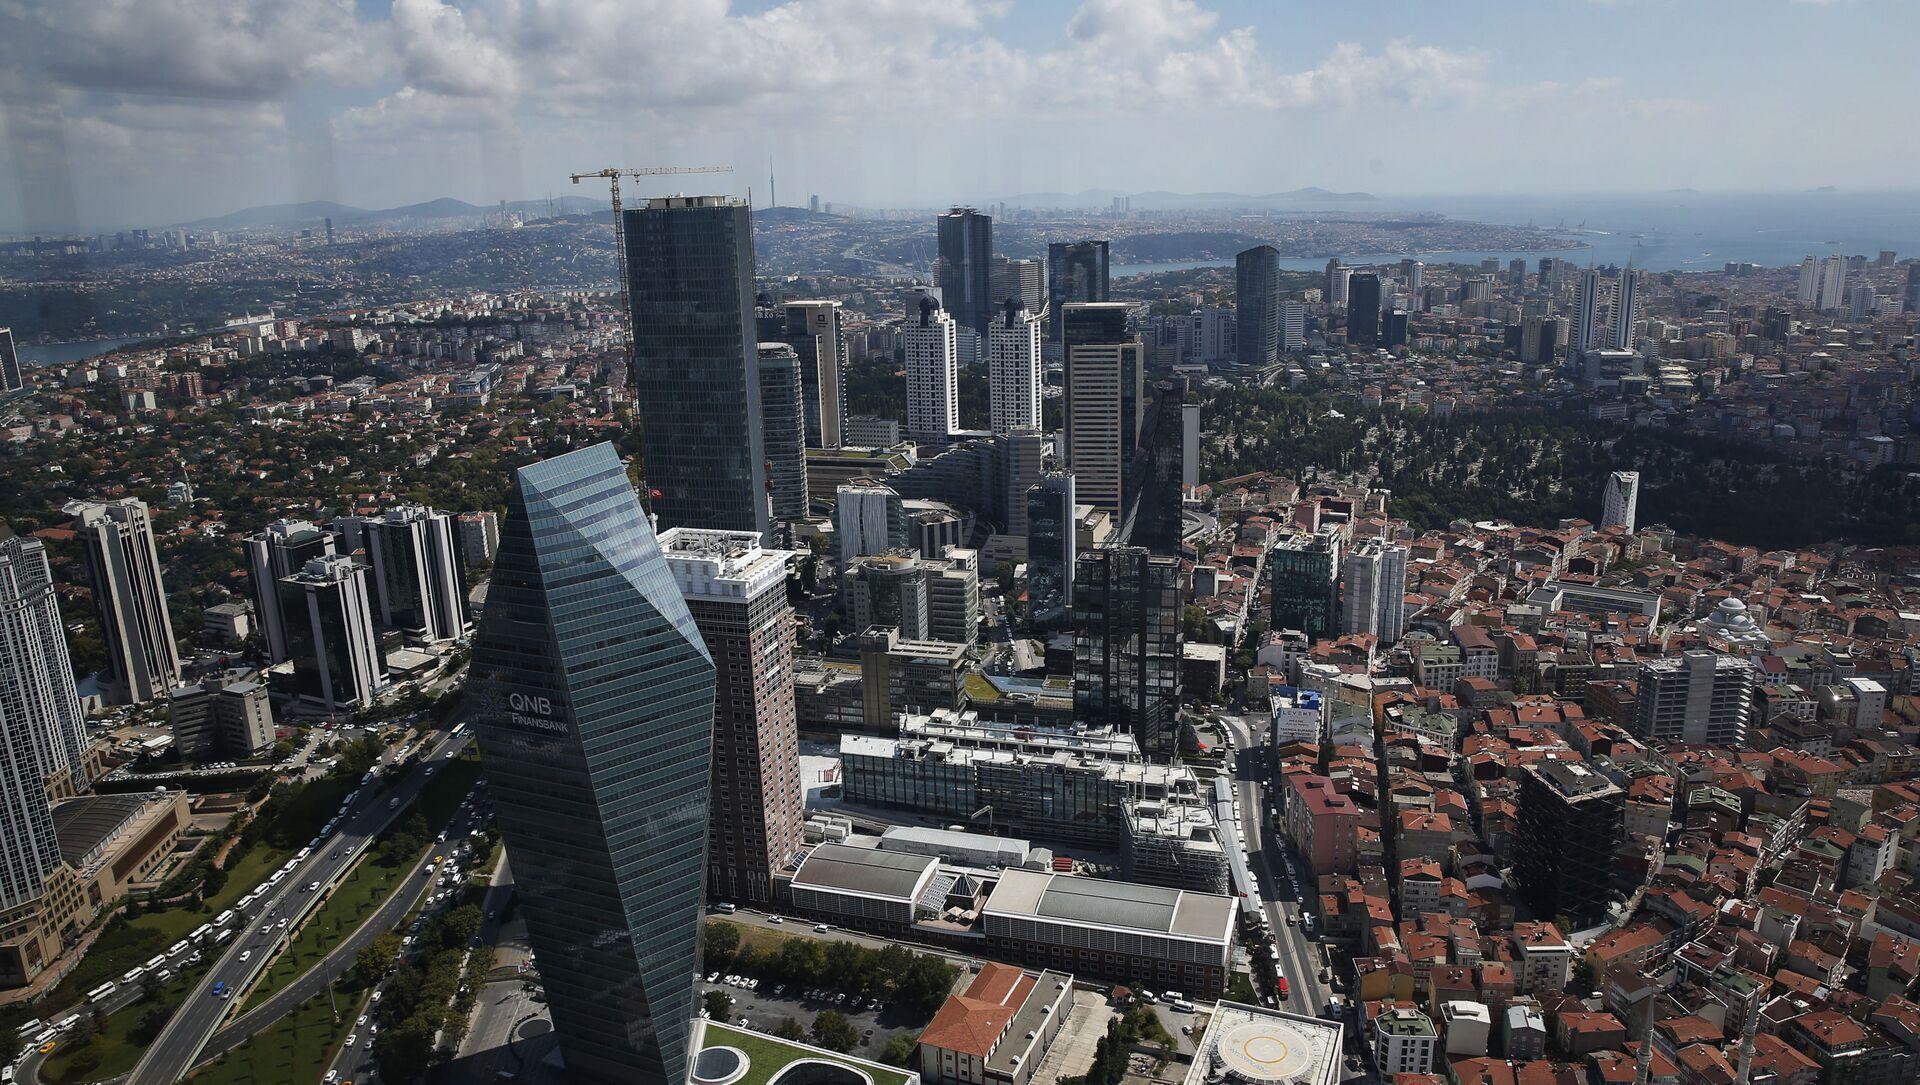 Вид на Стамбул, фото из архива - Sputnik Азербайджан, 1920, 05.02.2021